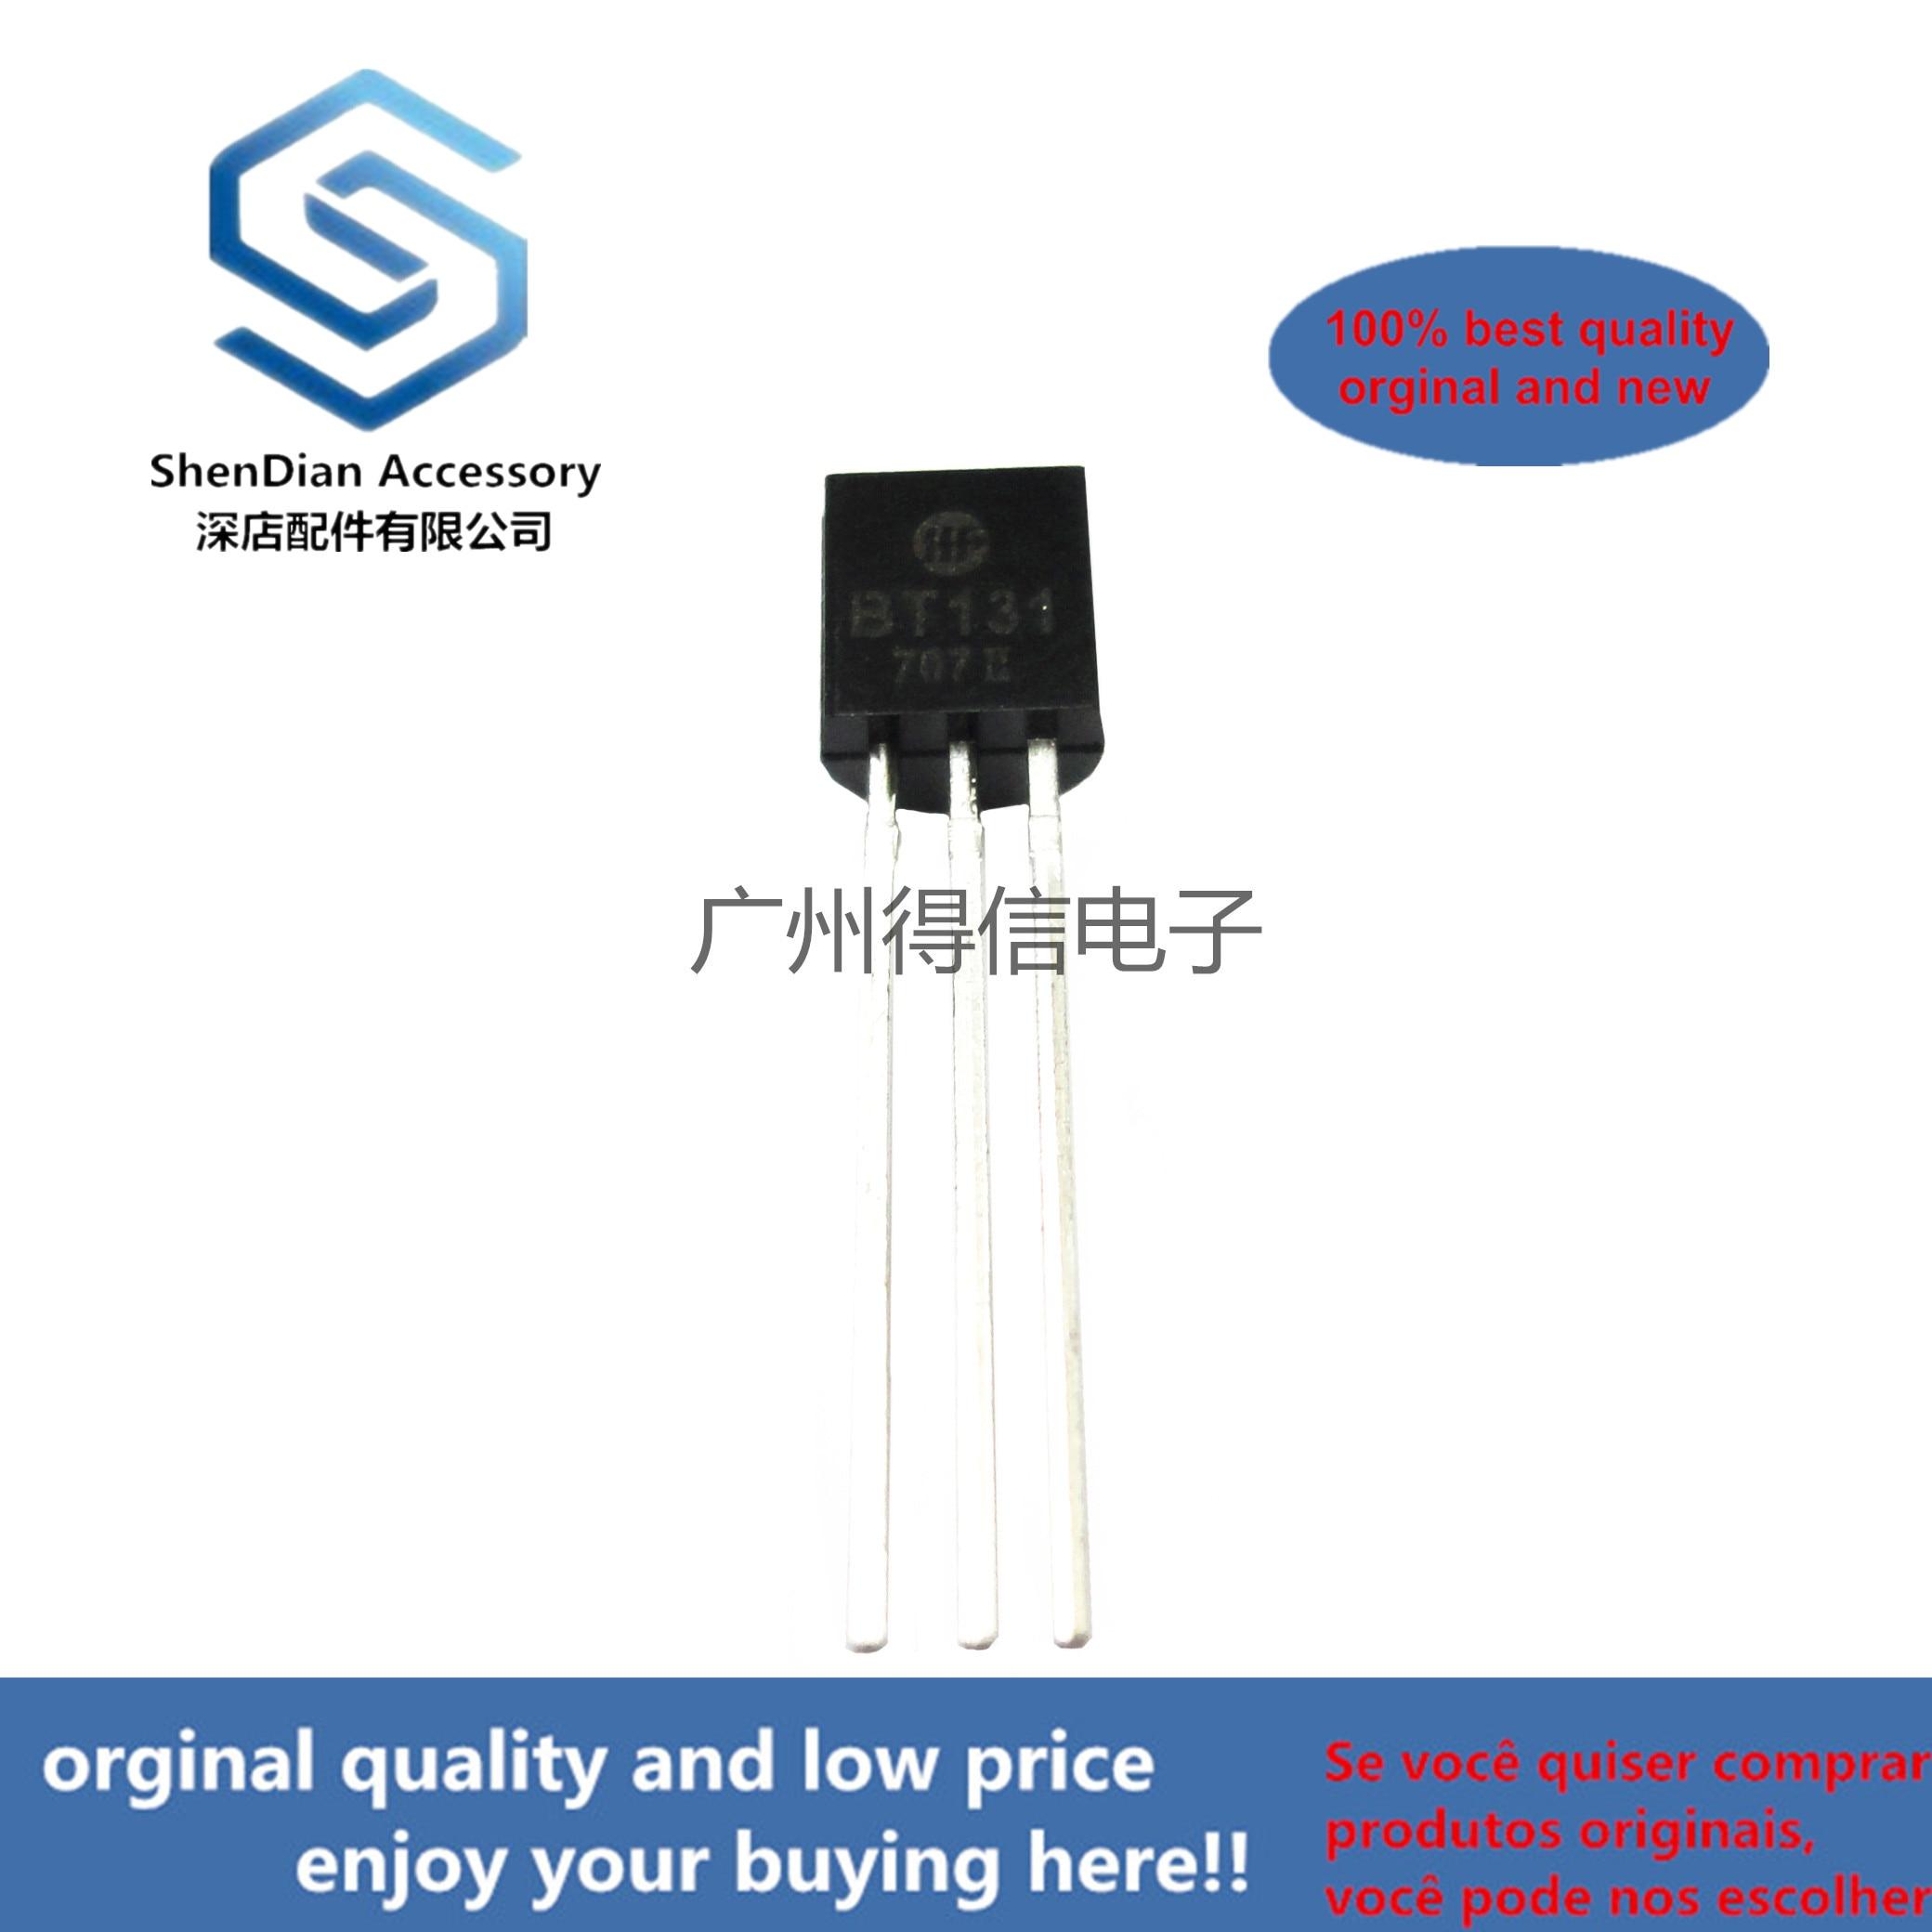 30pcs 100% Orginal New BT131-600 BT131 TO-92 Triacs Logic Level Real Photo